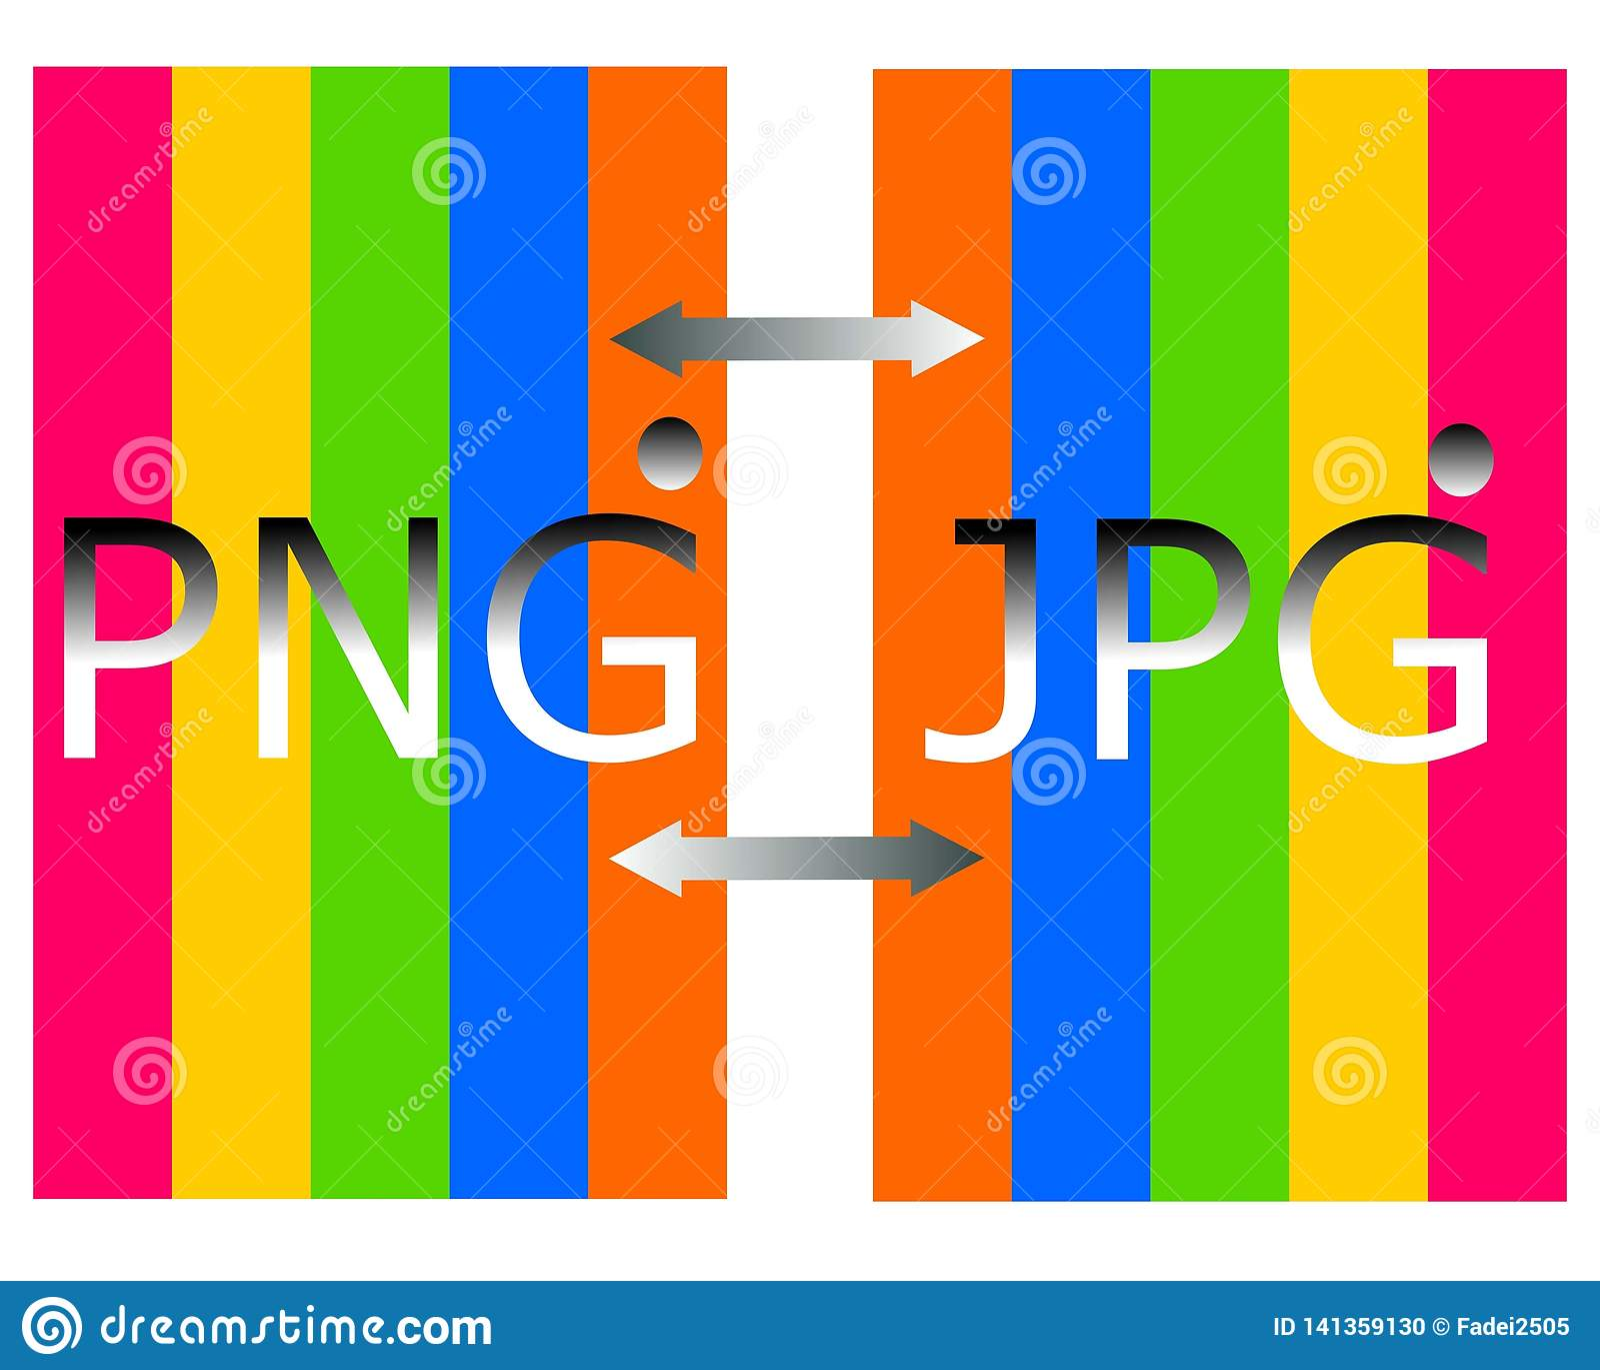 Dibujo del png en logotipo del fichero del jpg